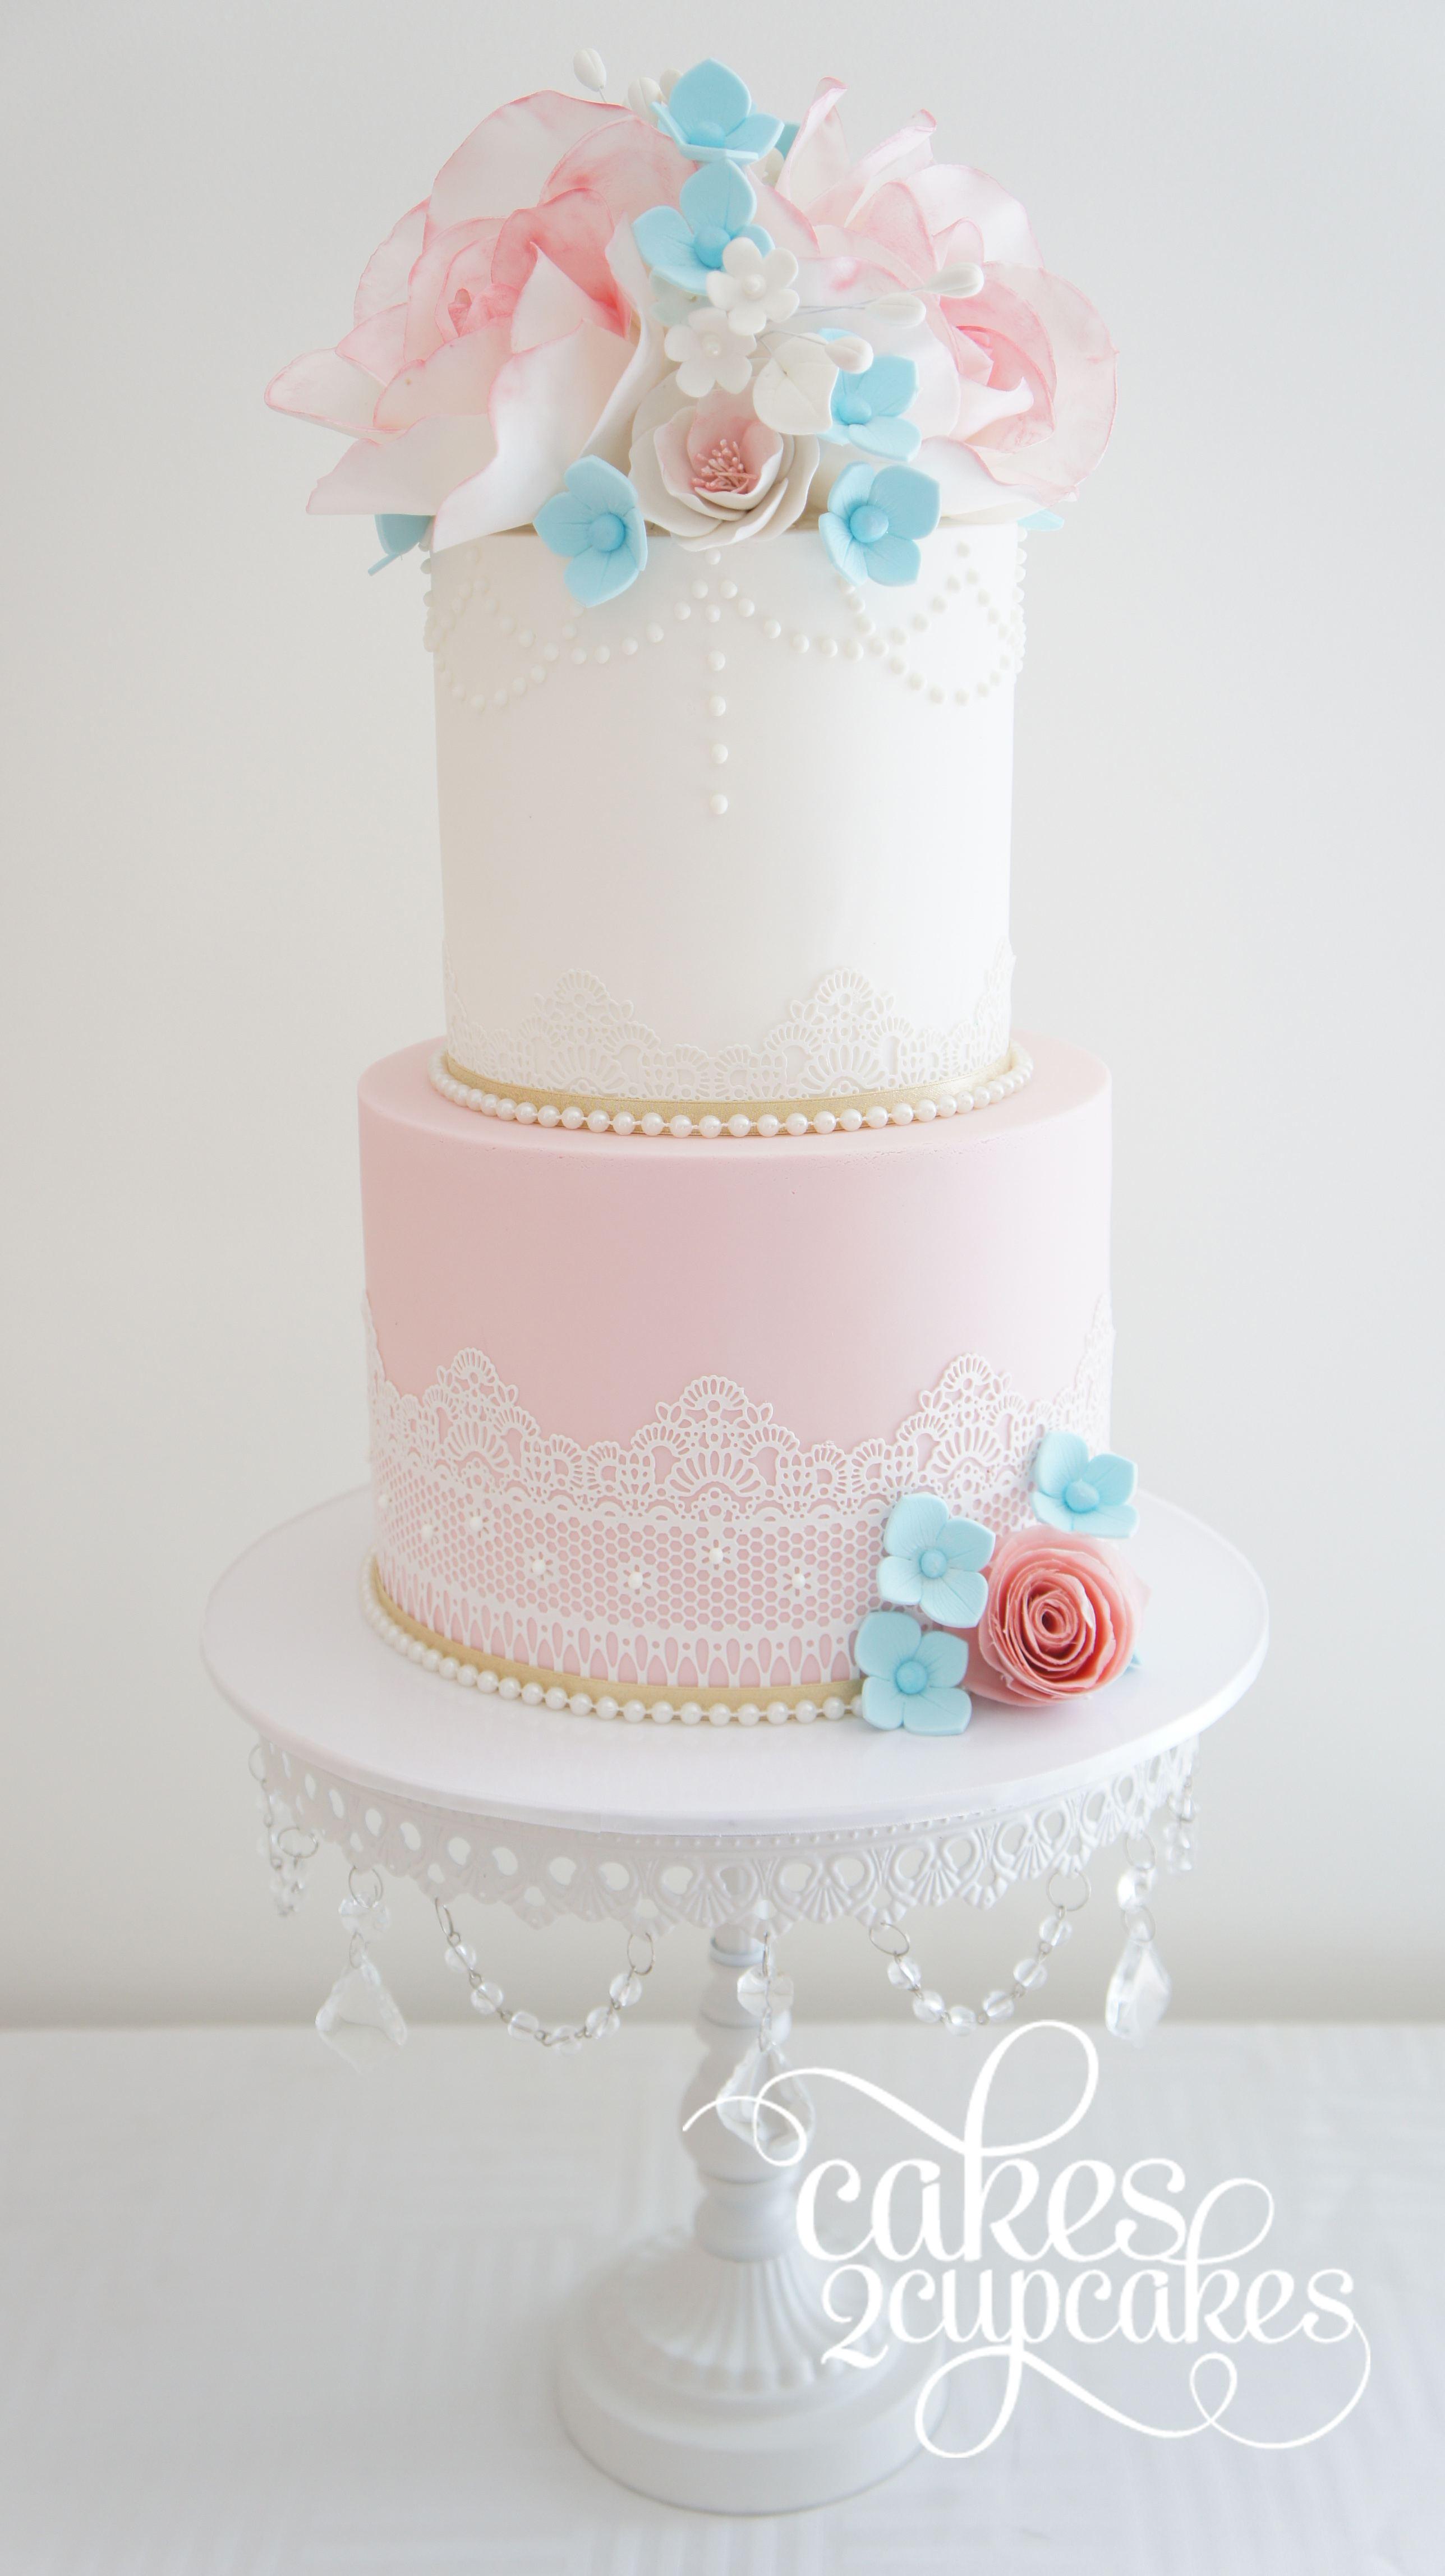 cakes2cupcakes-pink-blue.jpg